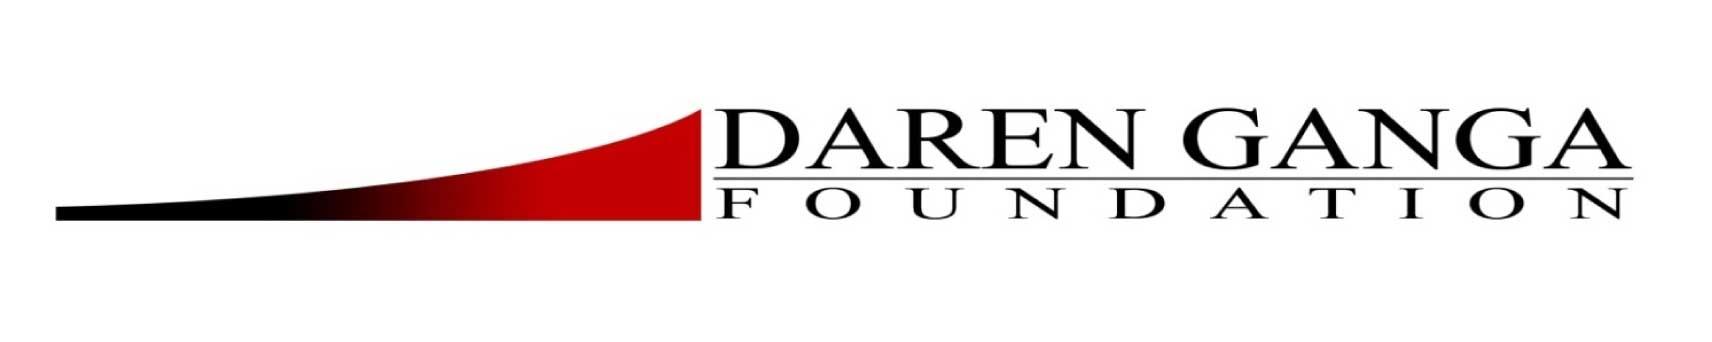 Daren Ganga Foundation gets International Award